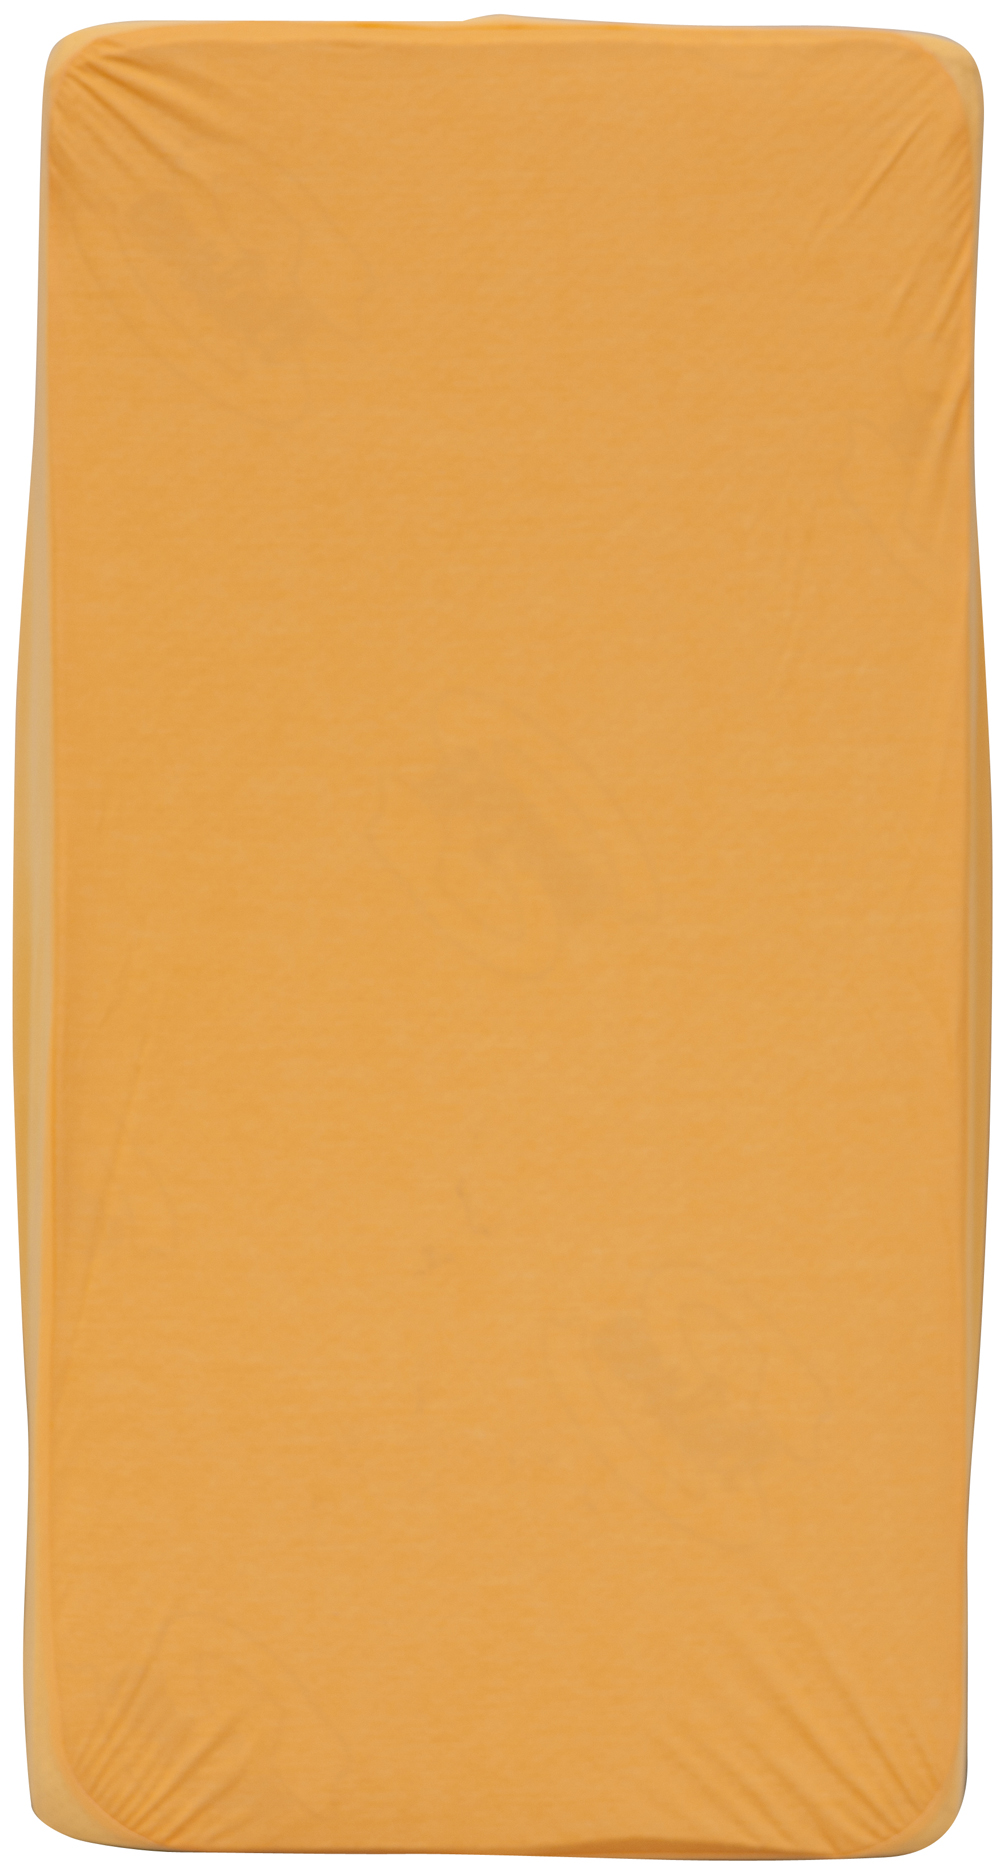 Scarlett, Nepropustné prostěradlo TENCEL - oranžová 60 x 120 cm